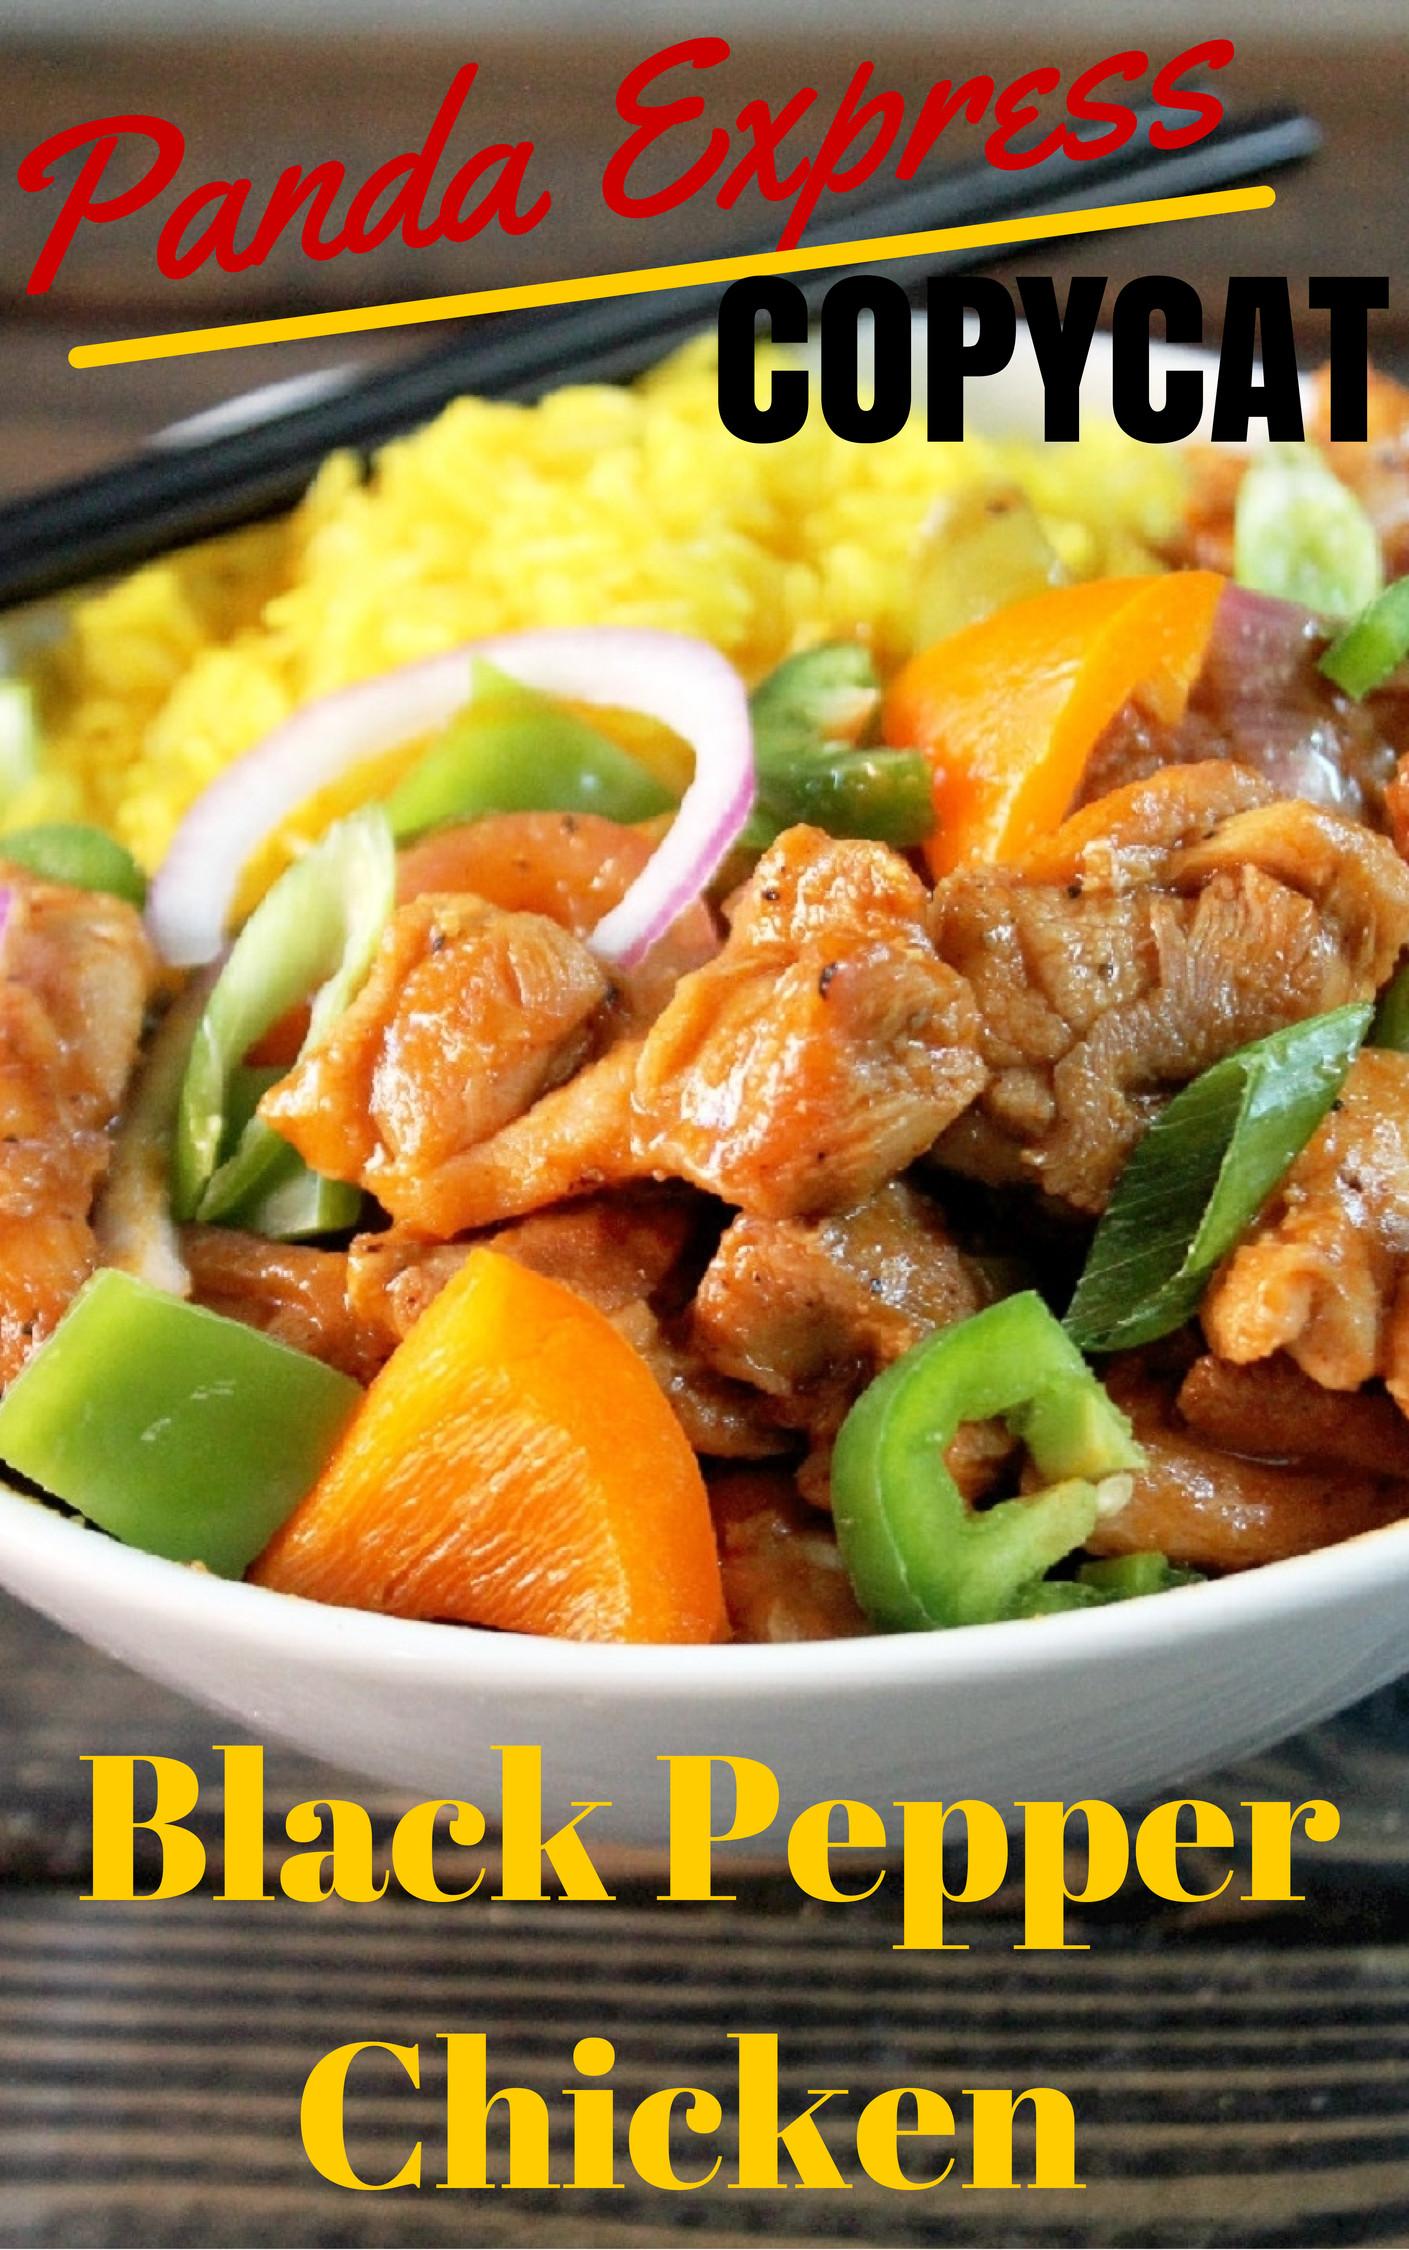 Panda Express Black Pepper Chicken (Copycat) - Dinner ...  |Panda Express Black Pepper Chicken